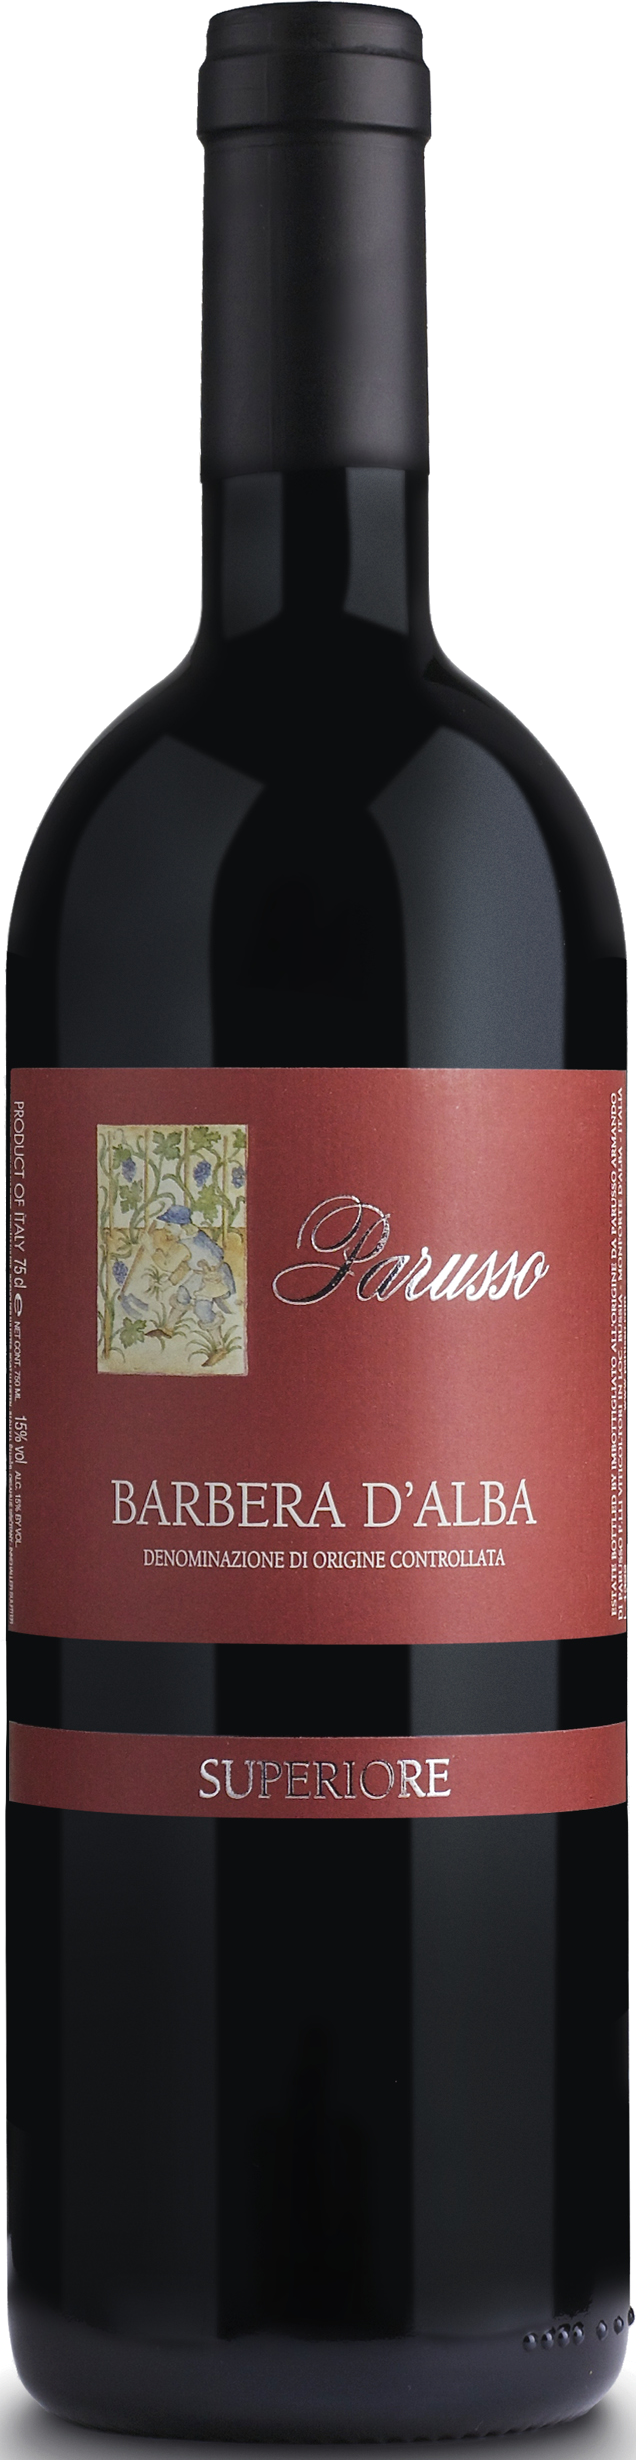 Barbera d'Alba Sup. Etichetta Rossa DOC 2015 Doppia Magnum 3 L